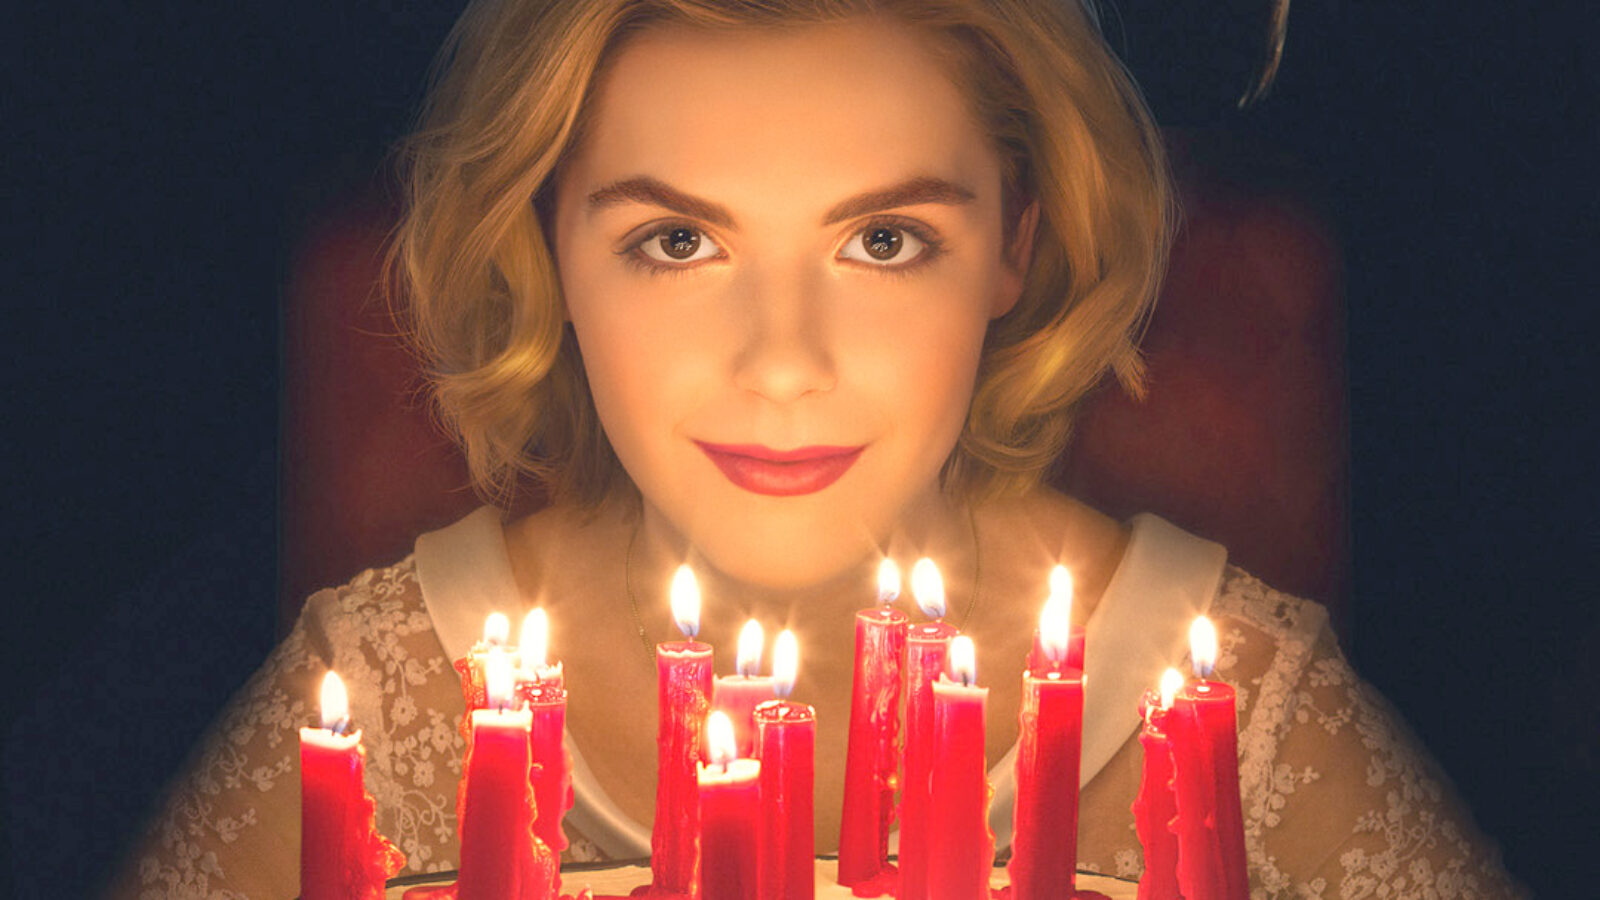 Serien-Tipps: Good Girls, Sabrina, Killing Eve